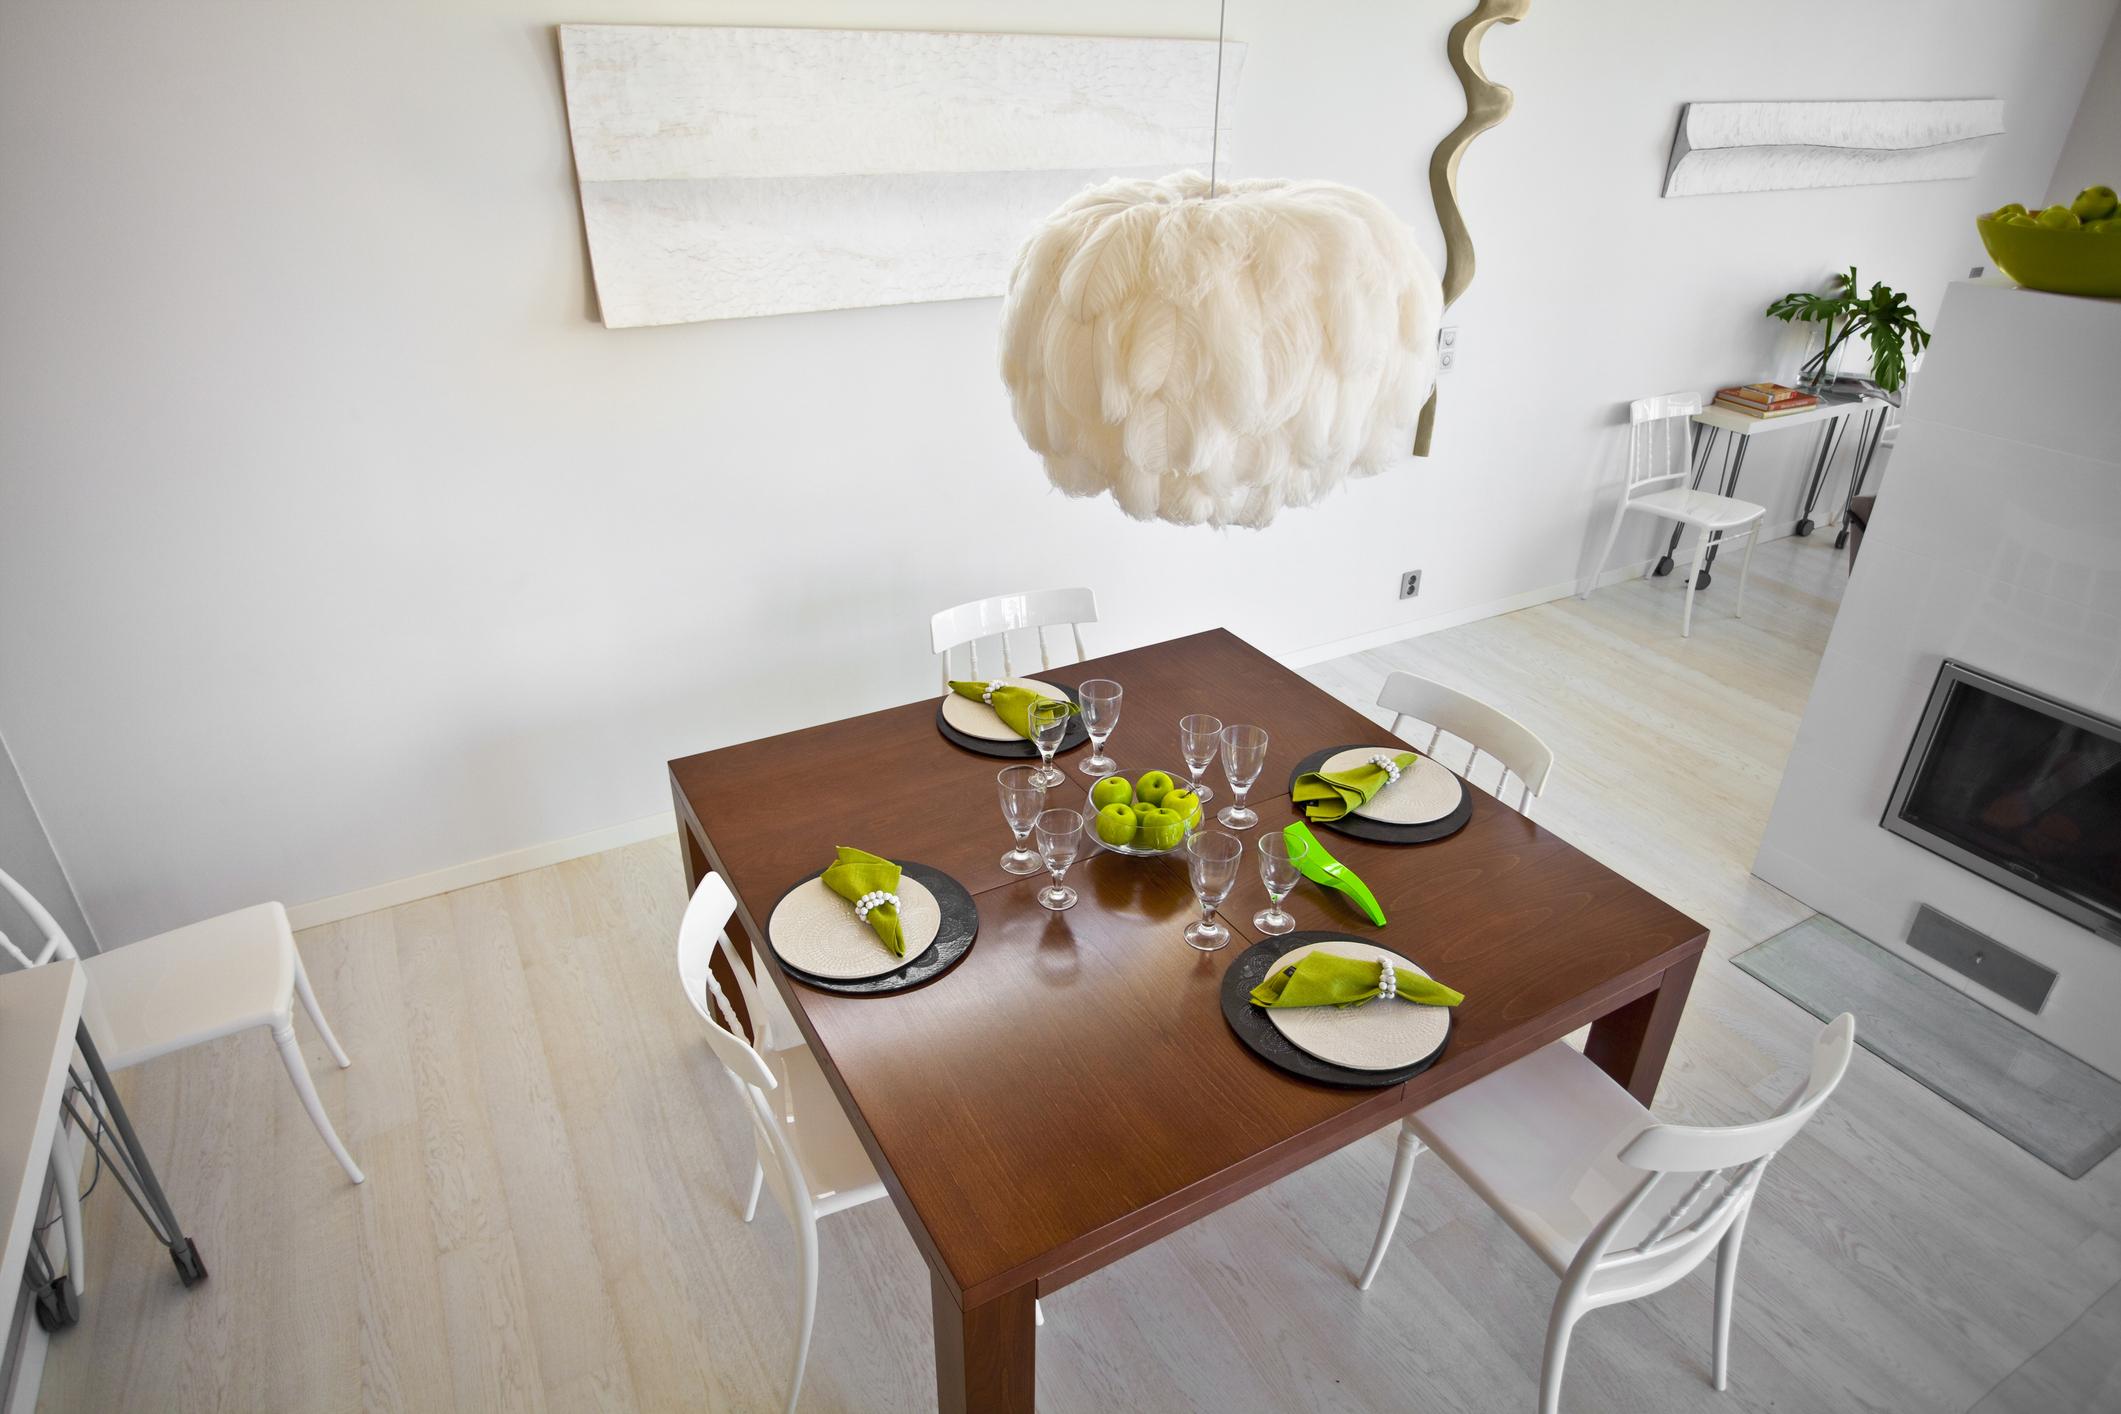 Sveriges dyraste möbel